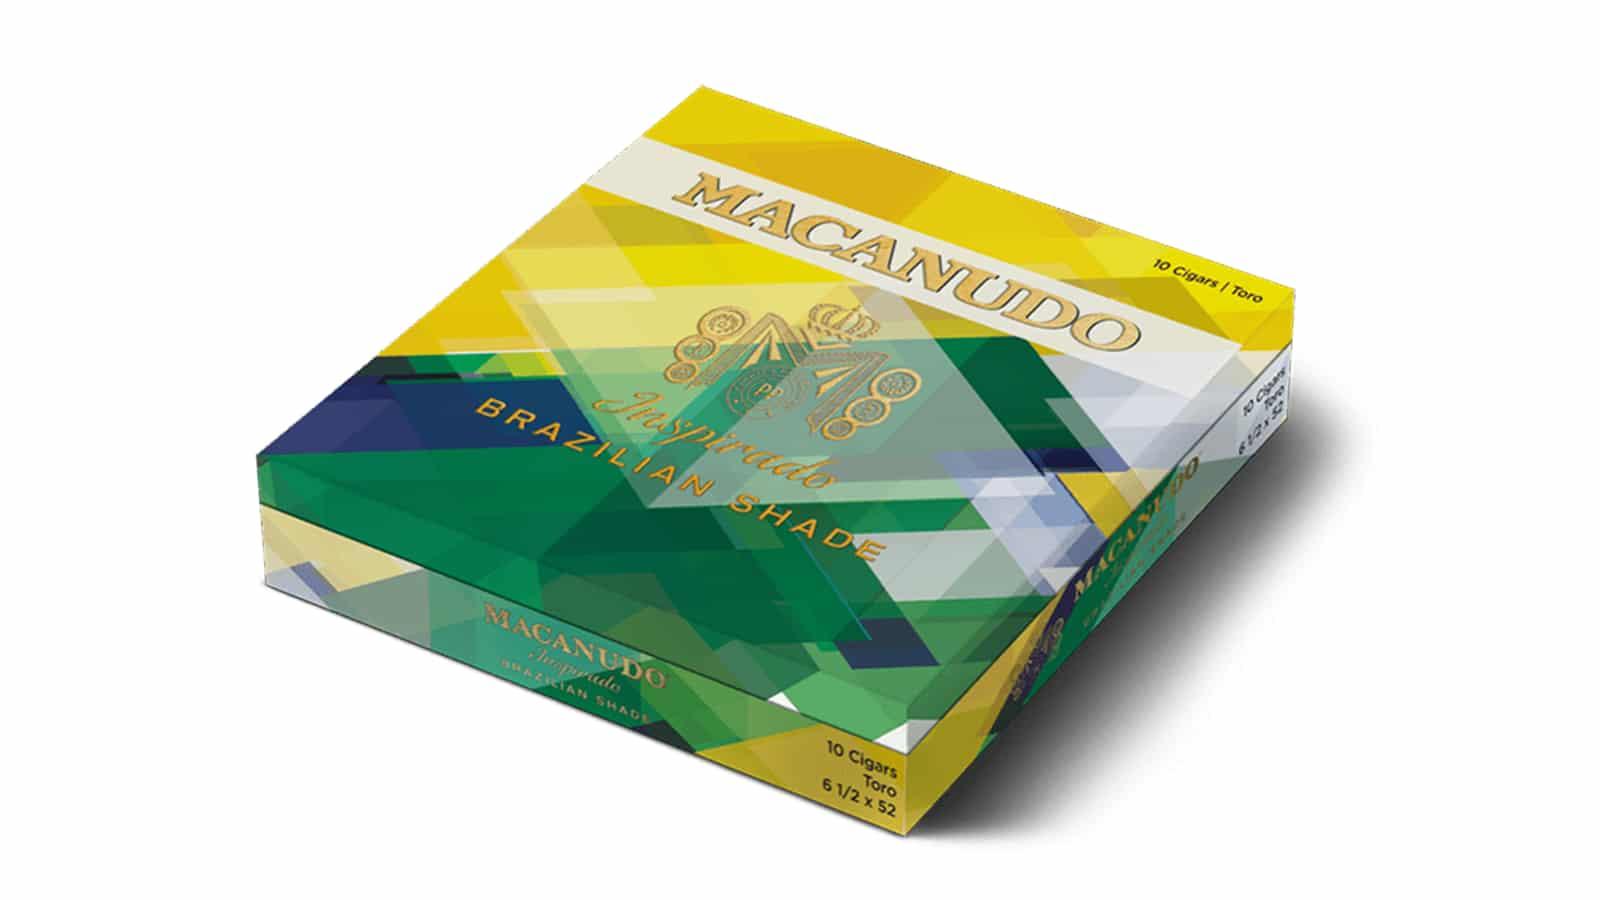 Macanudo Inspirado Brazilian Shade